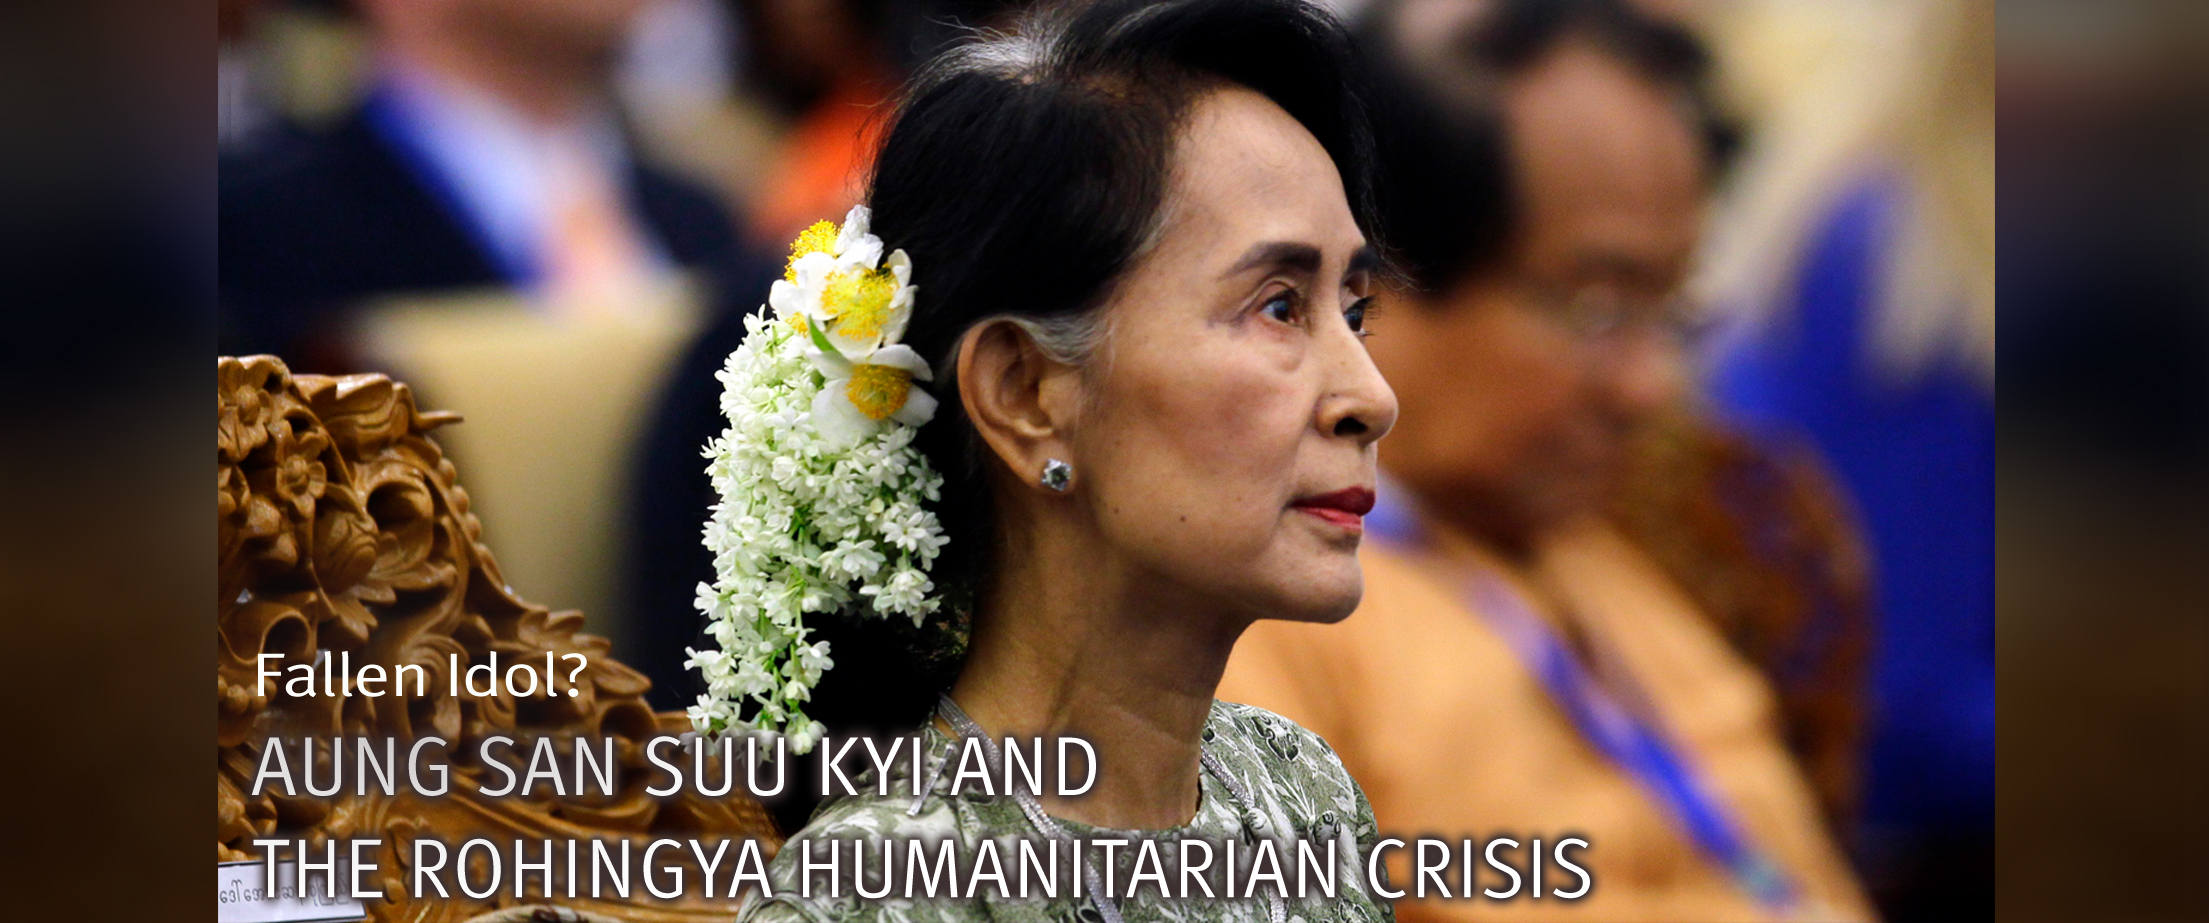 Fallen Idol? Aung San Suu Kyi and the Rohingya Humanitarian Crisis